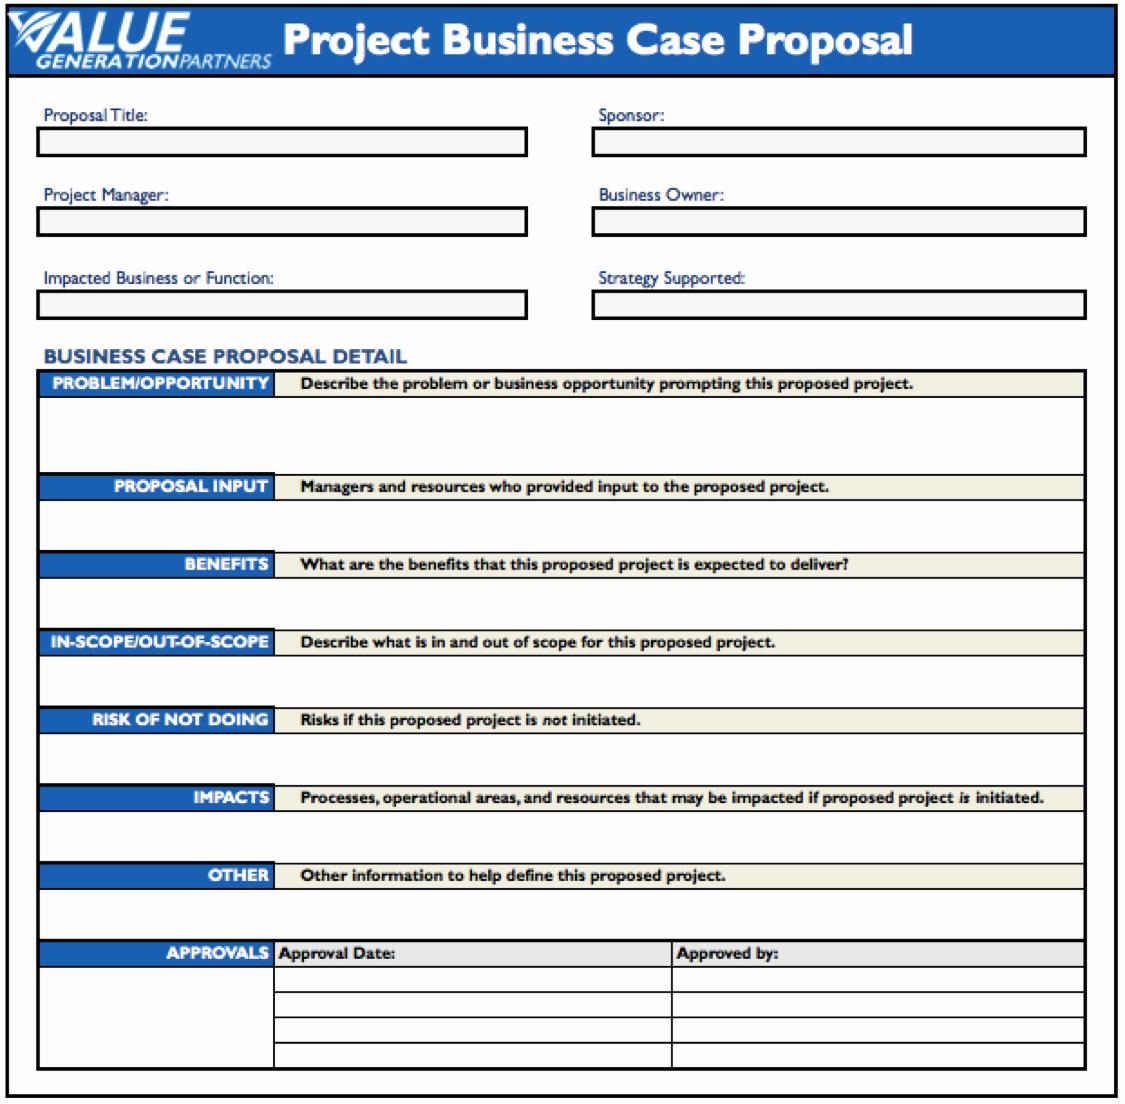 Project Management – Value Generation Partners Vblog